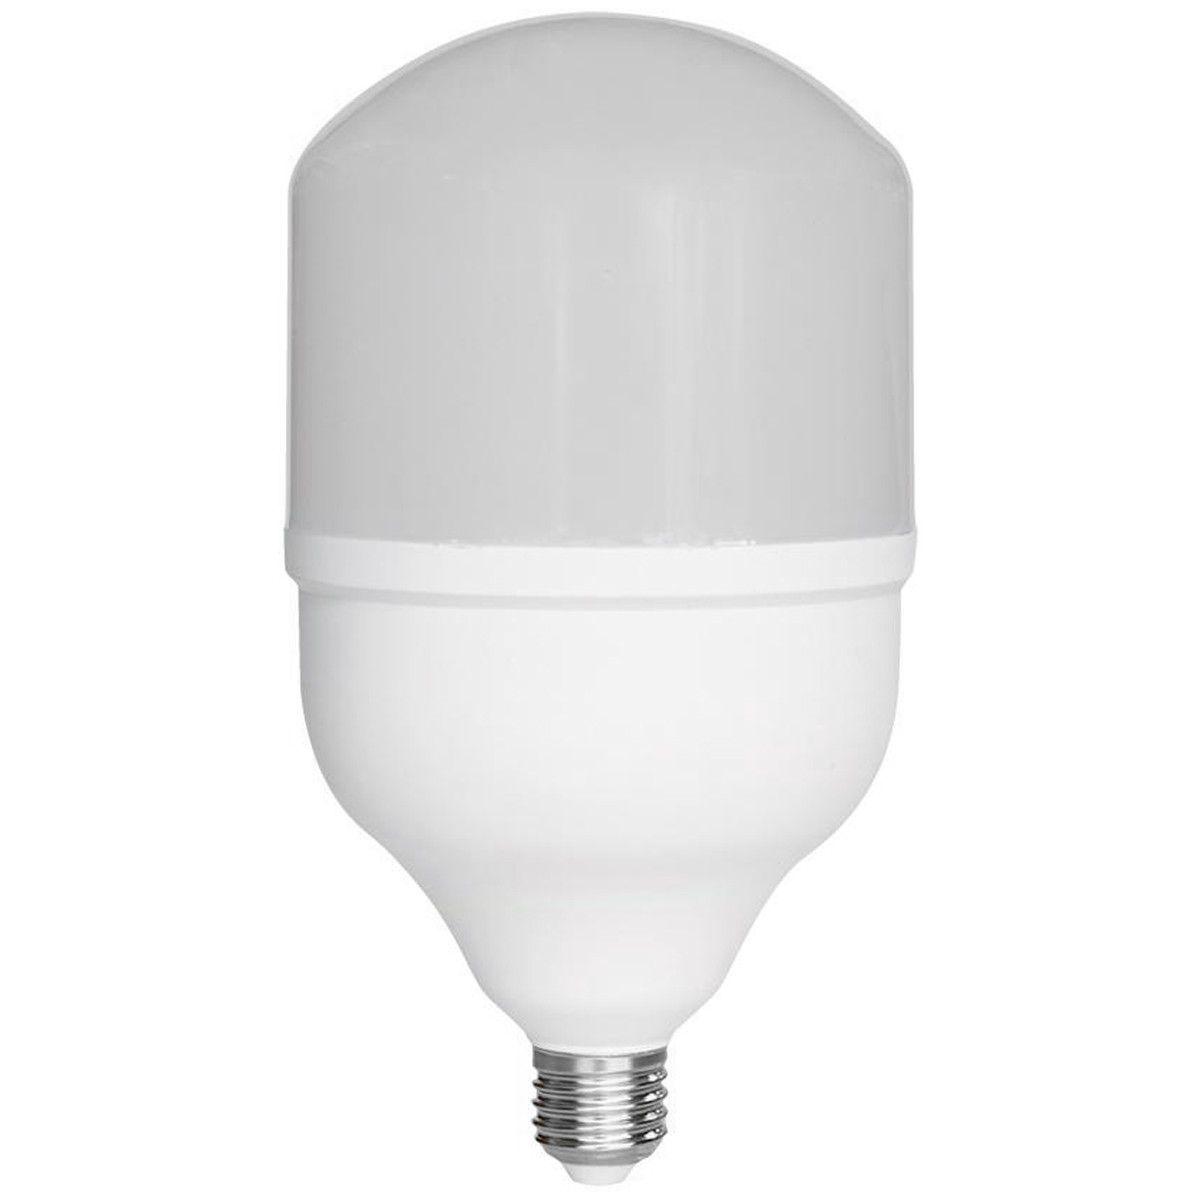 Lampada LED High Bulbo 40W E27 6500K Luz Branca Bivolt LLUM